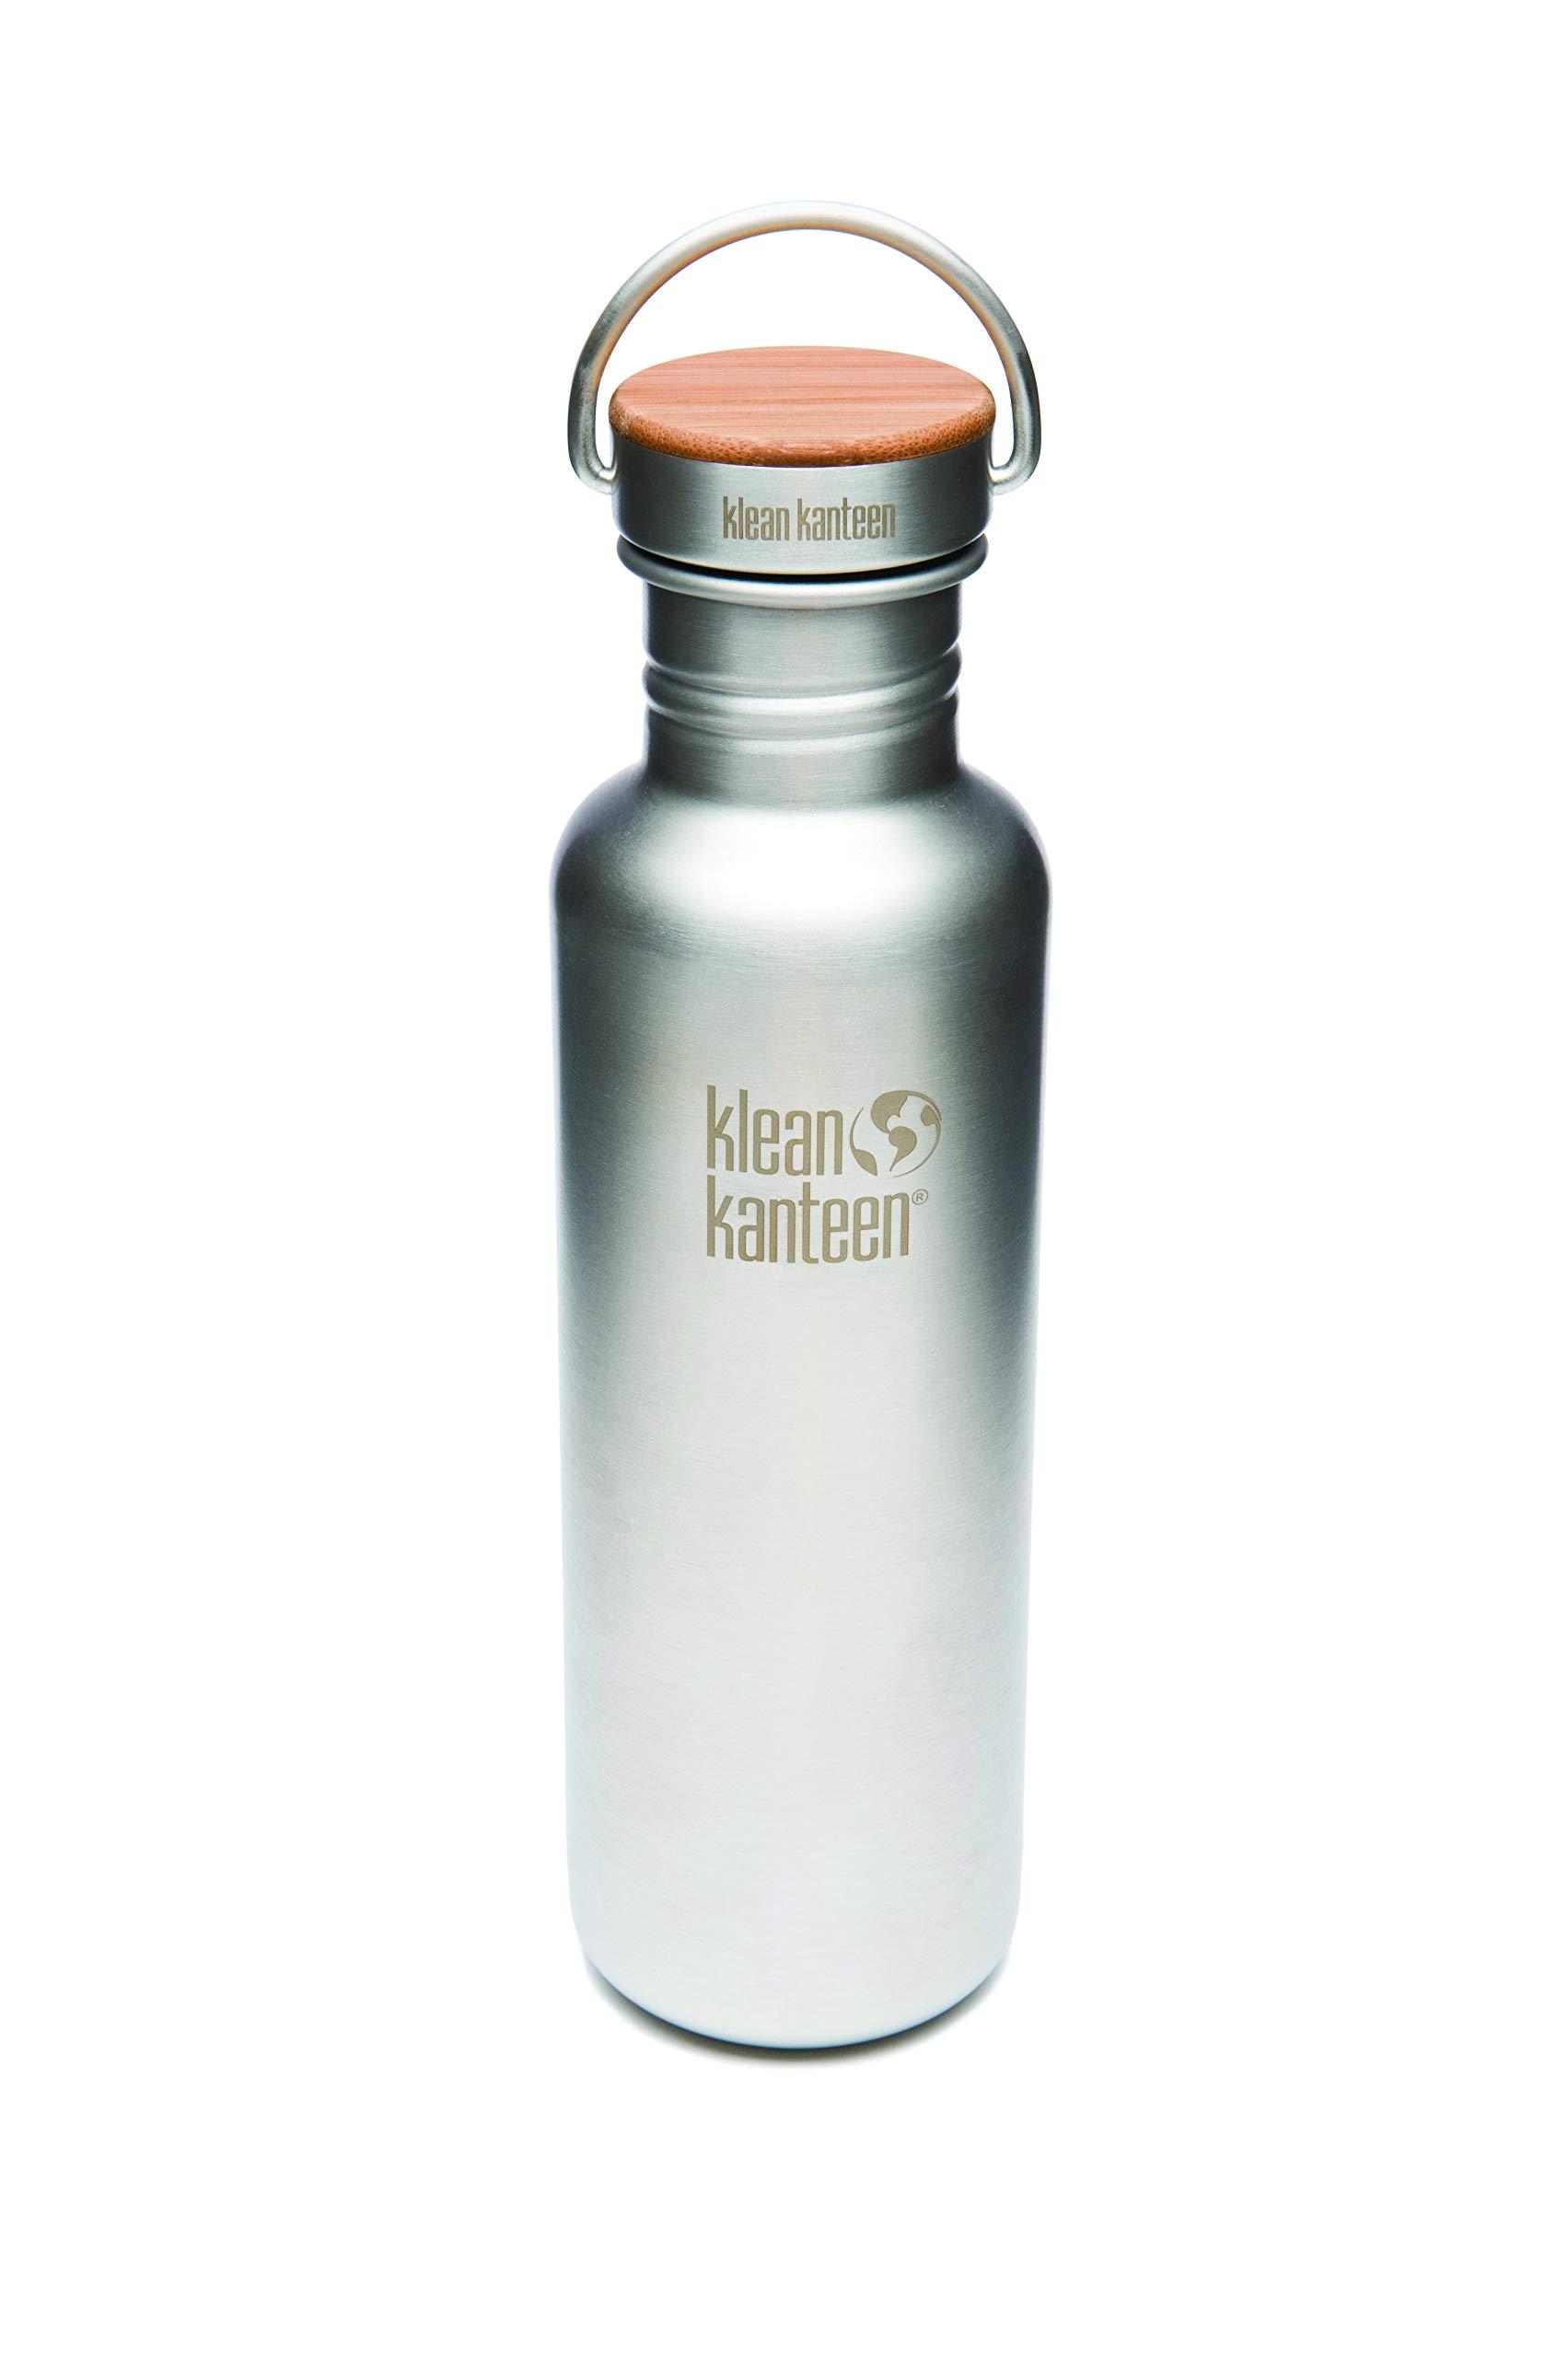 KLEAN KANTEEN Reflect 800ml Bottle, One Size